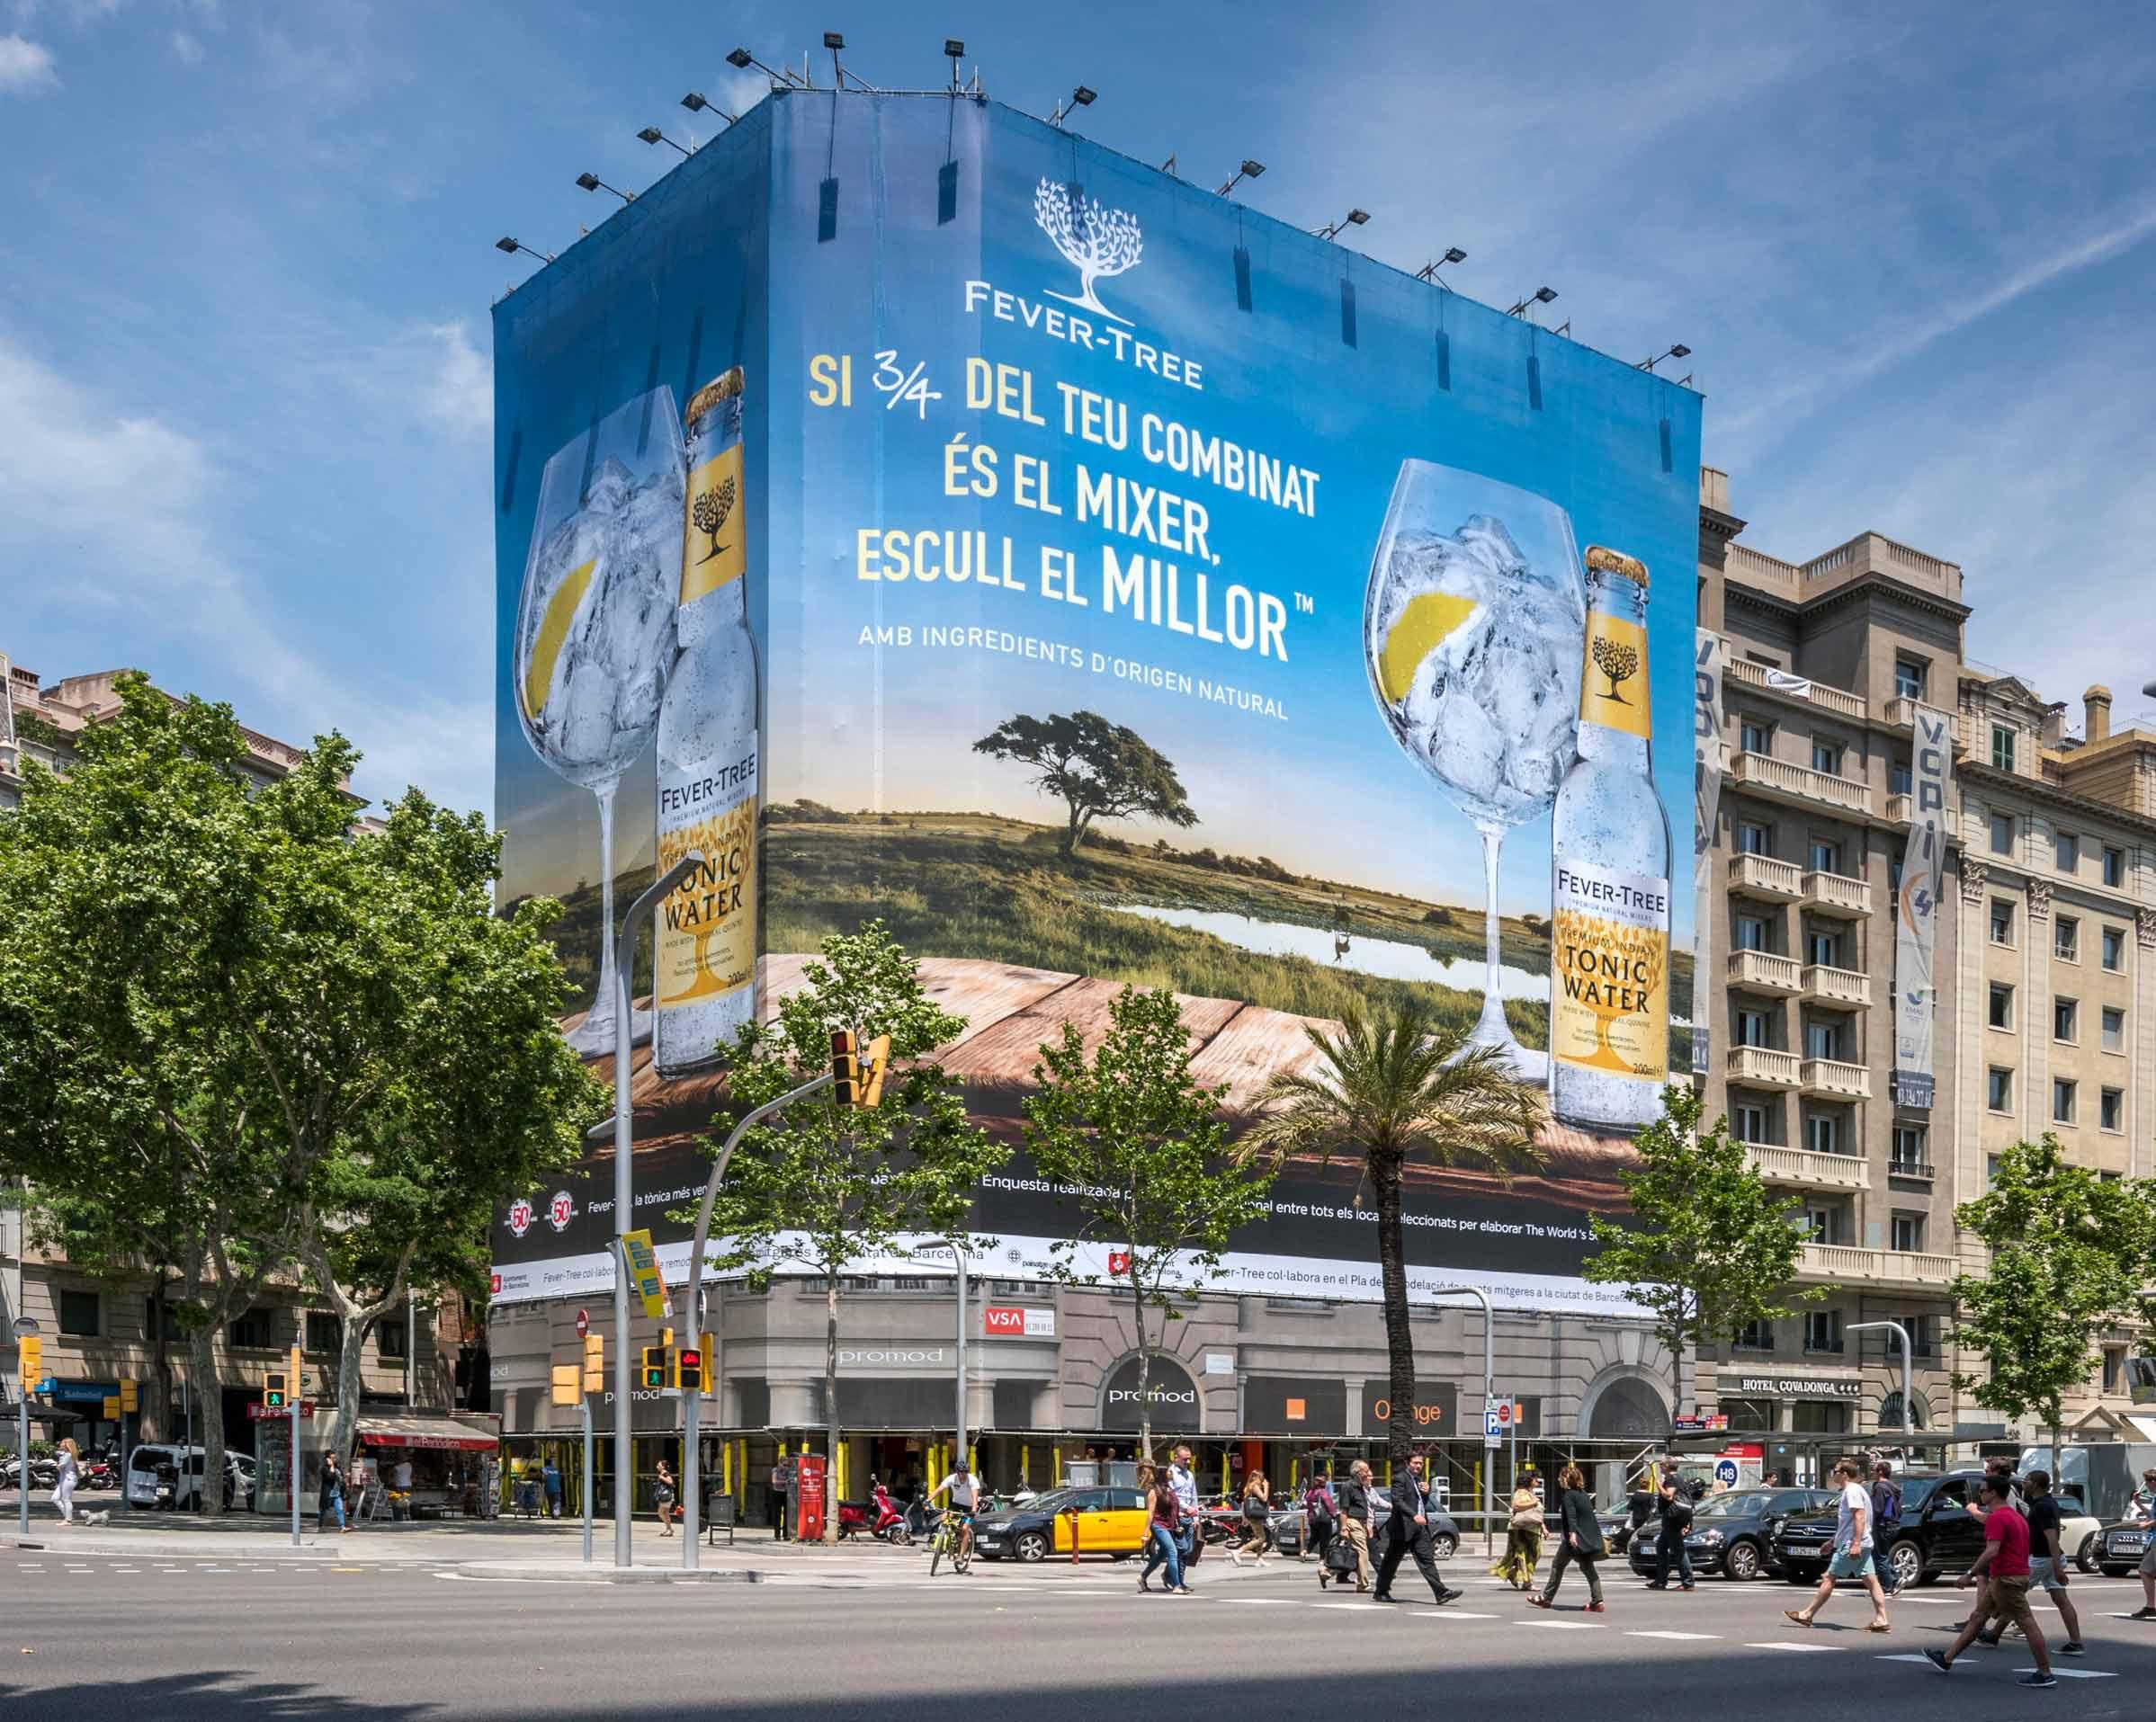 lona-publicitaria-barcelona-avenida-diagonal-598-fever-tree-panoramica-vsa-comunicacion